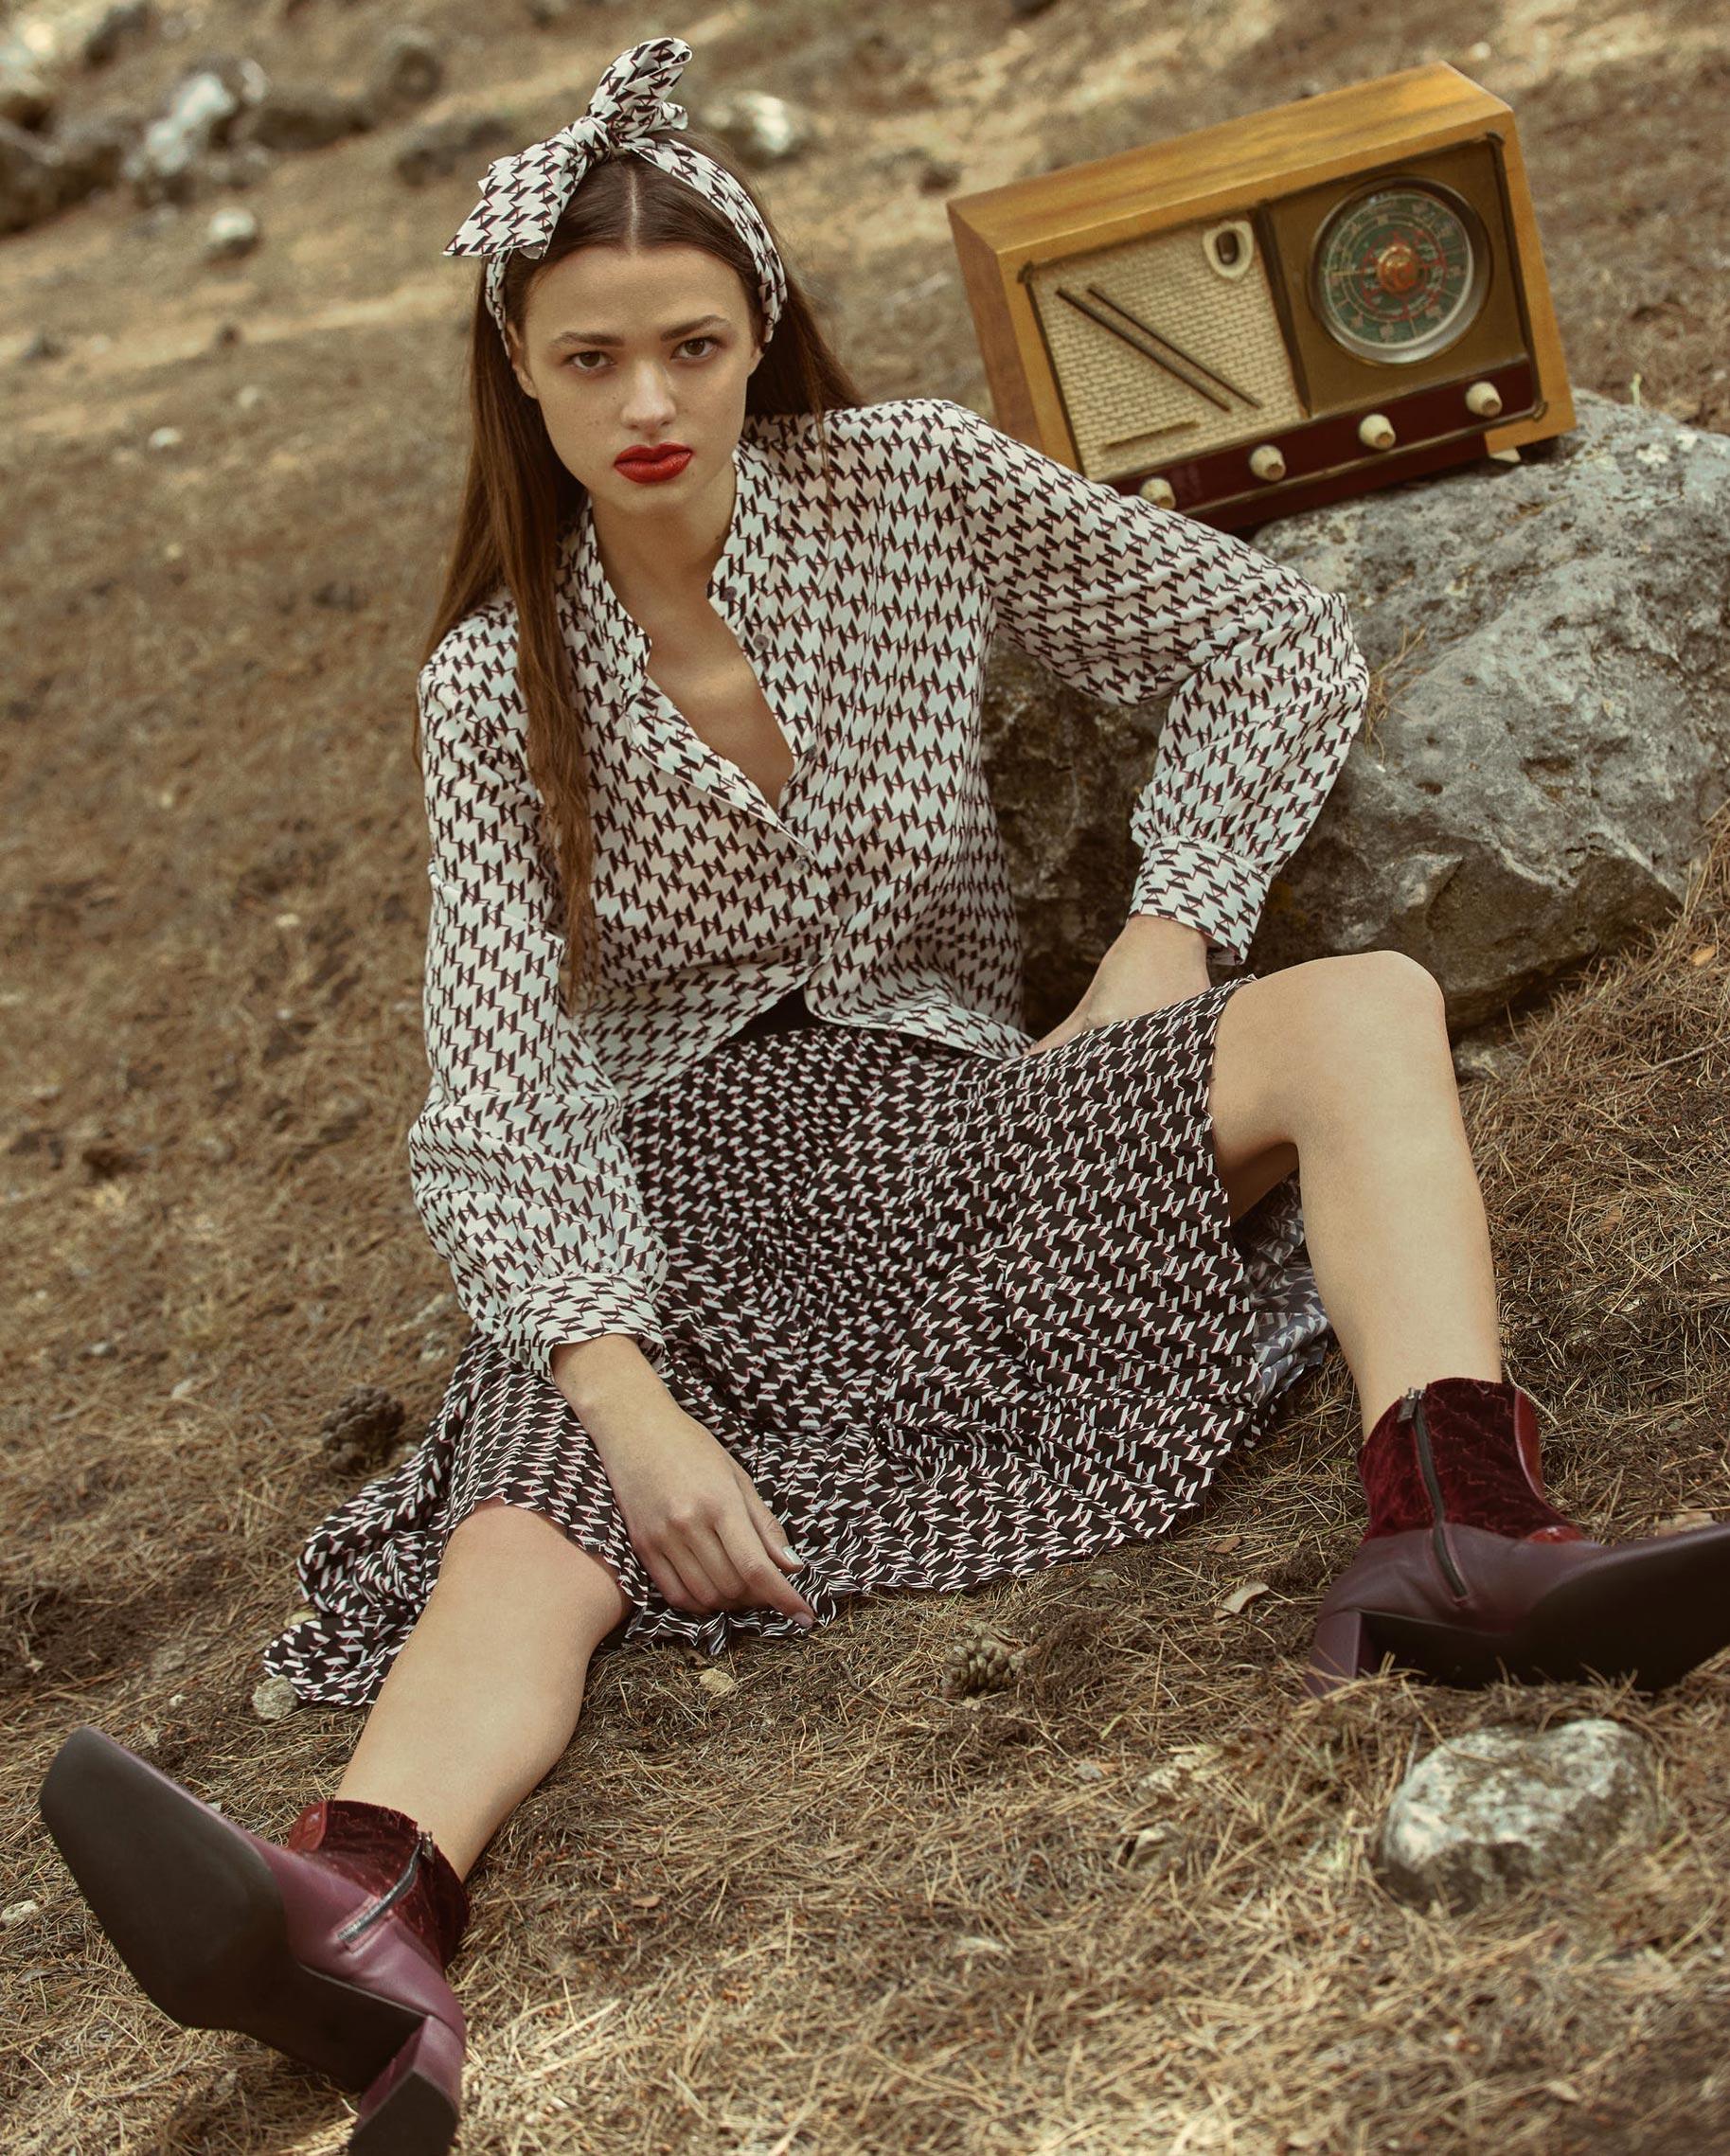 Диана Свиридова в лесу демонстрирует винтажную технику и новинки моды / фото 02